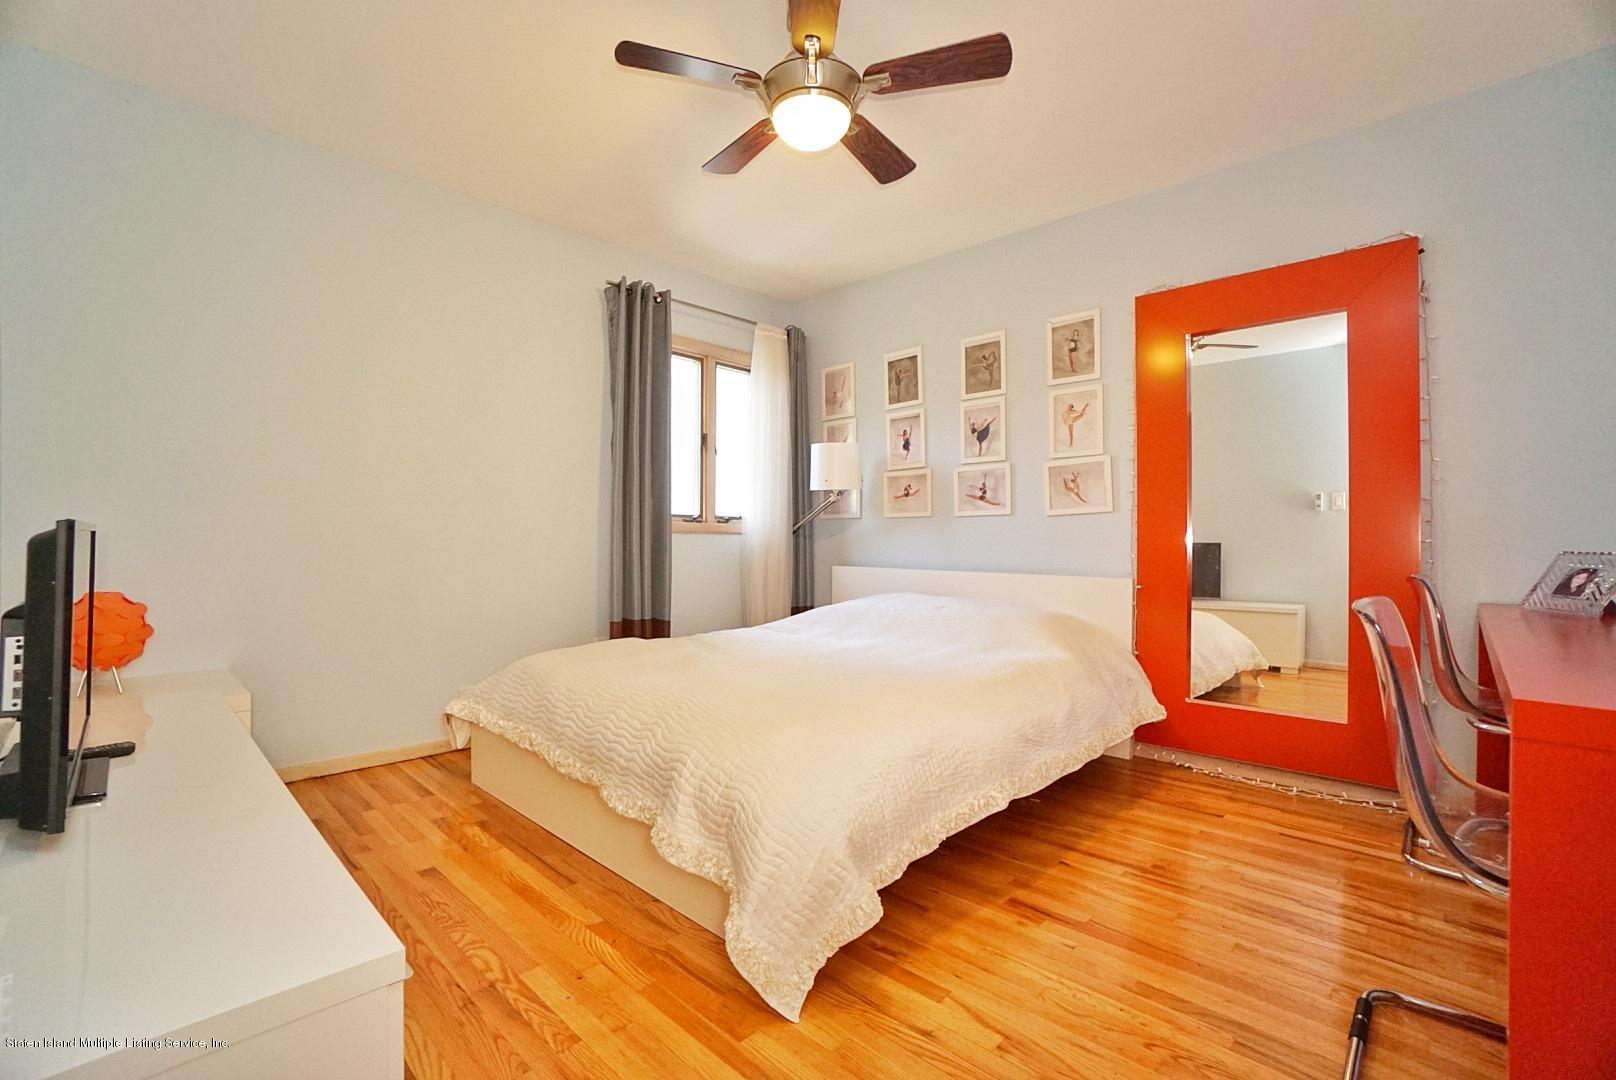 Single Family - Detached 183 Kensington Avenue  Staten Island, NY 10305, MLS-1127107-26